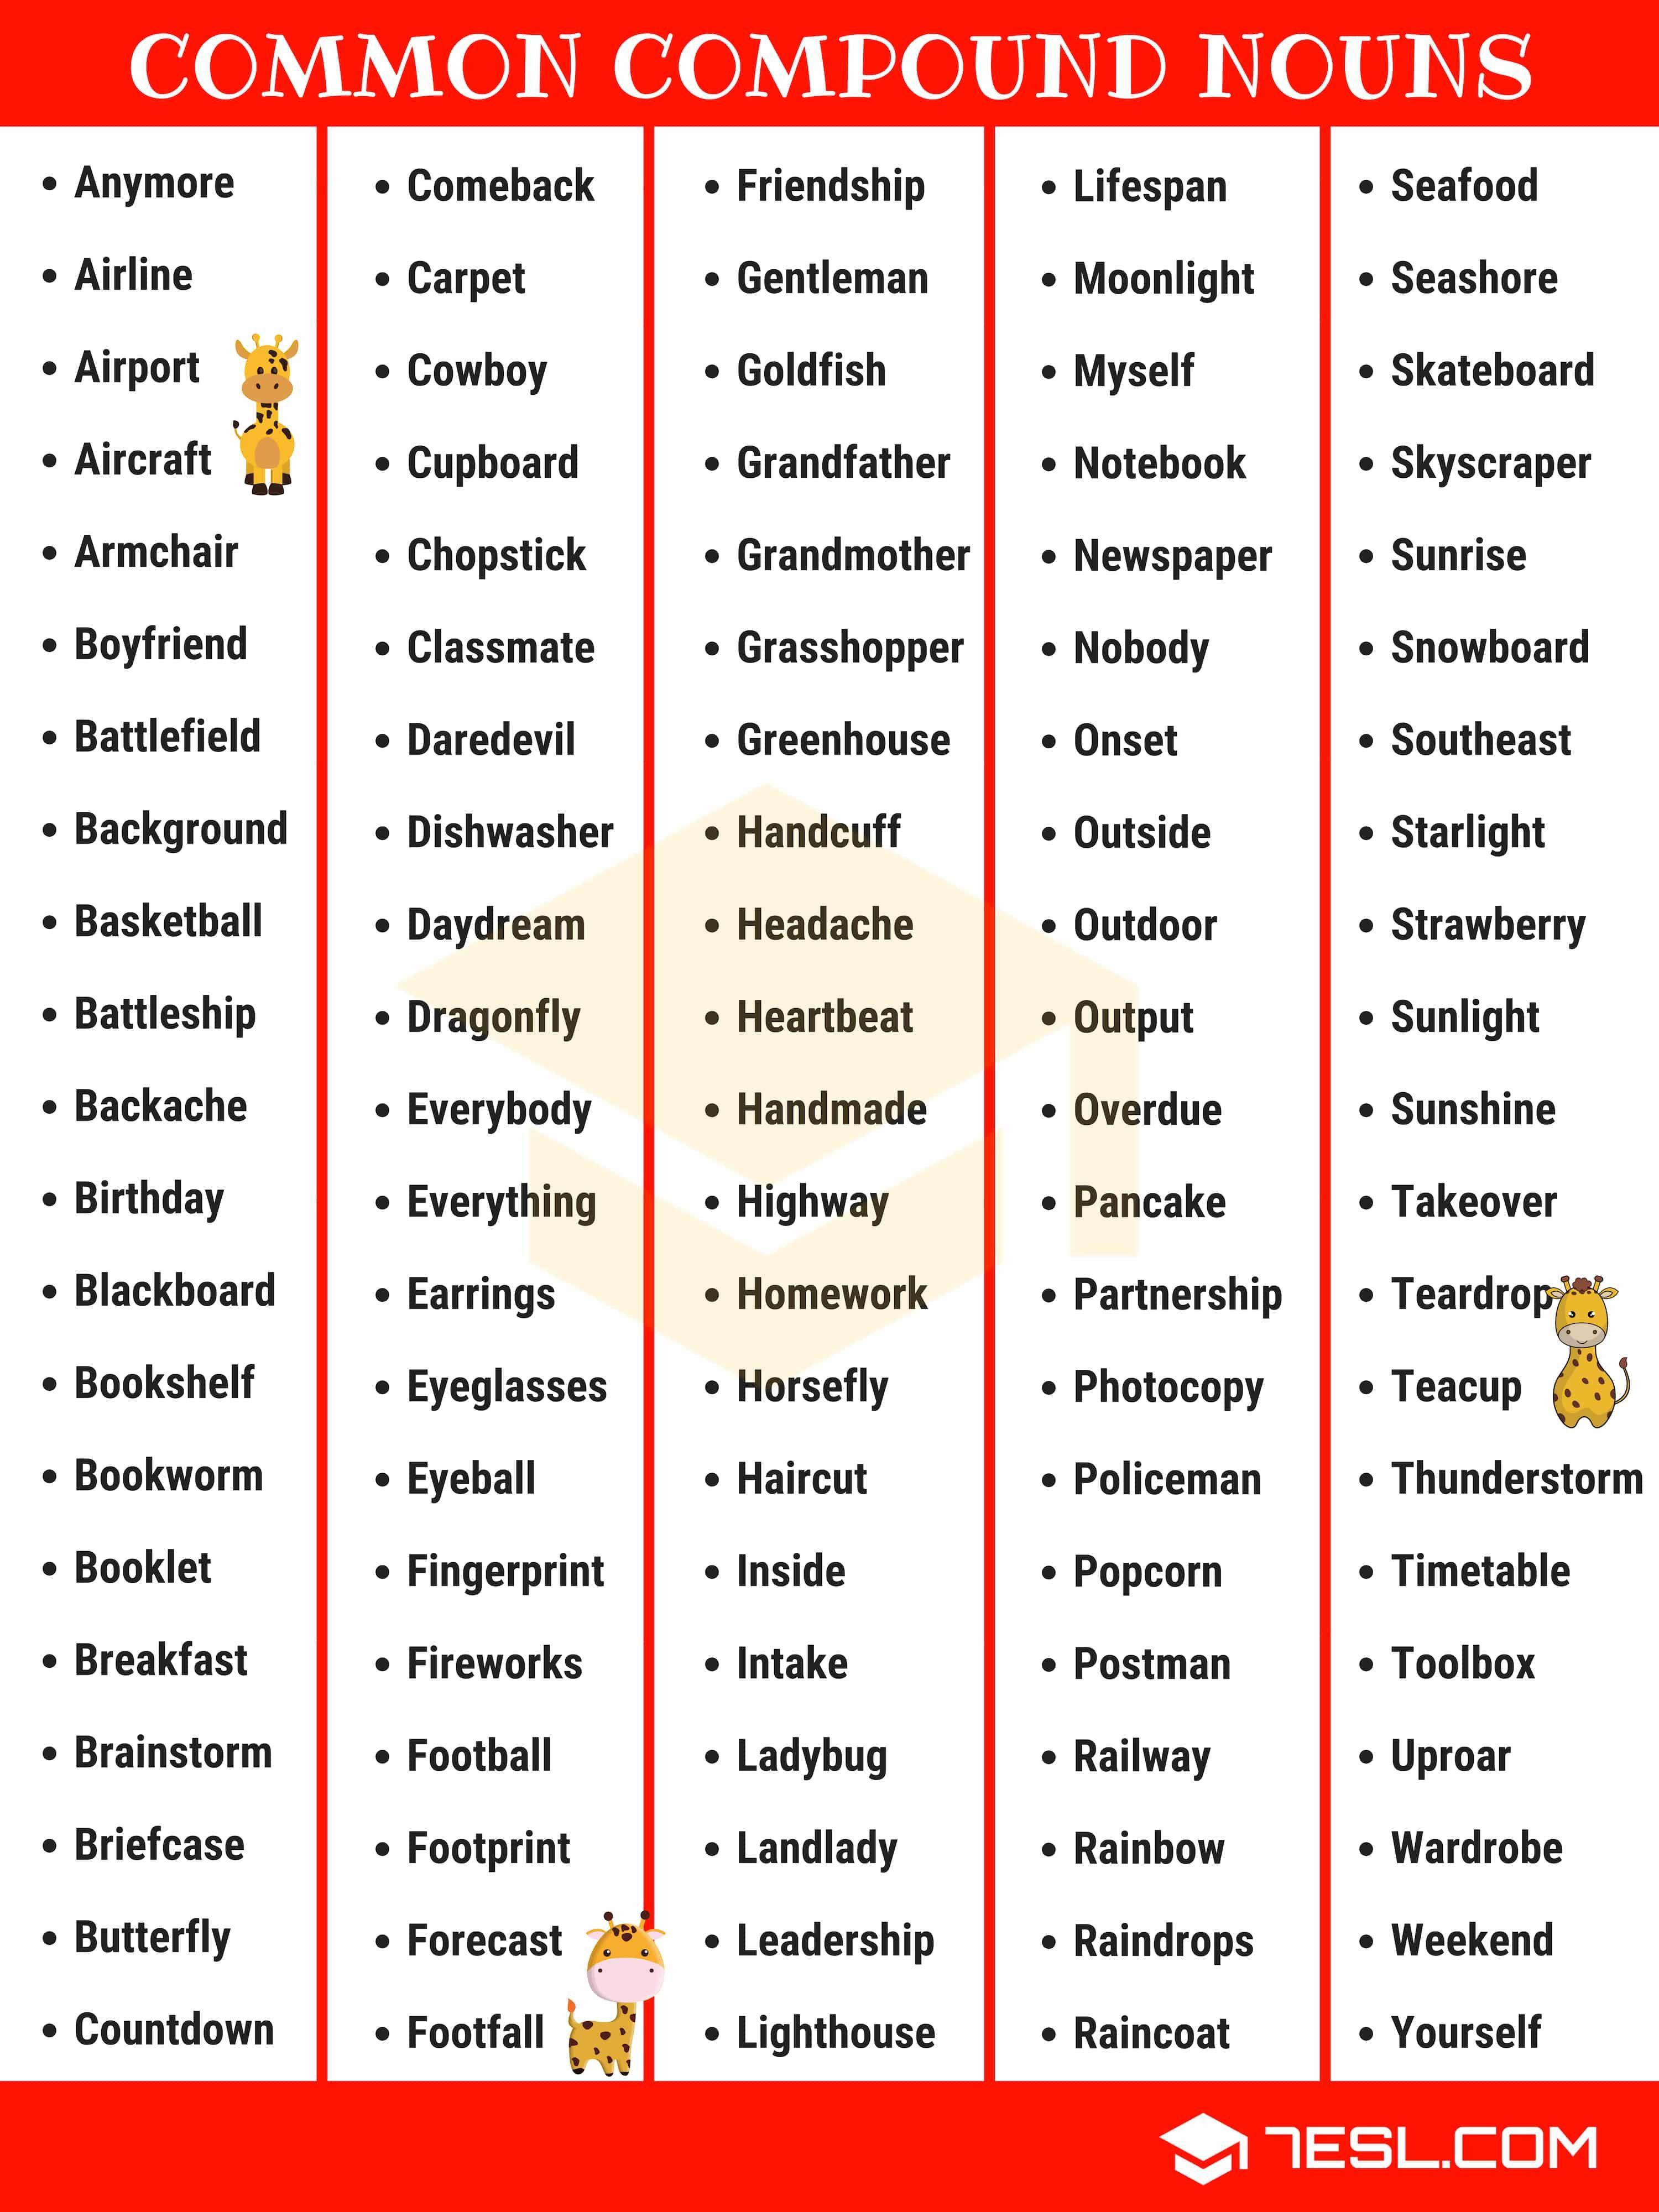 Compound Nouns 110 Common Compound Nouns In English